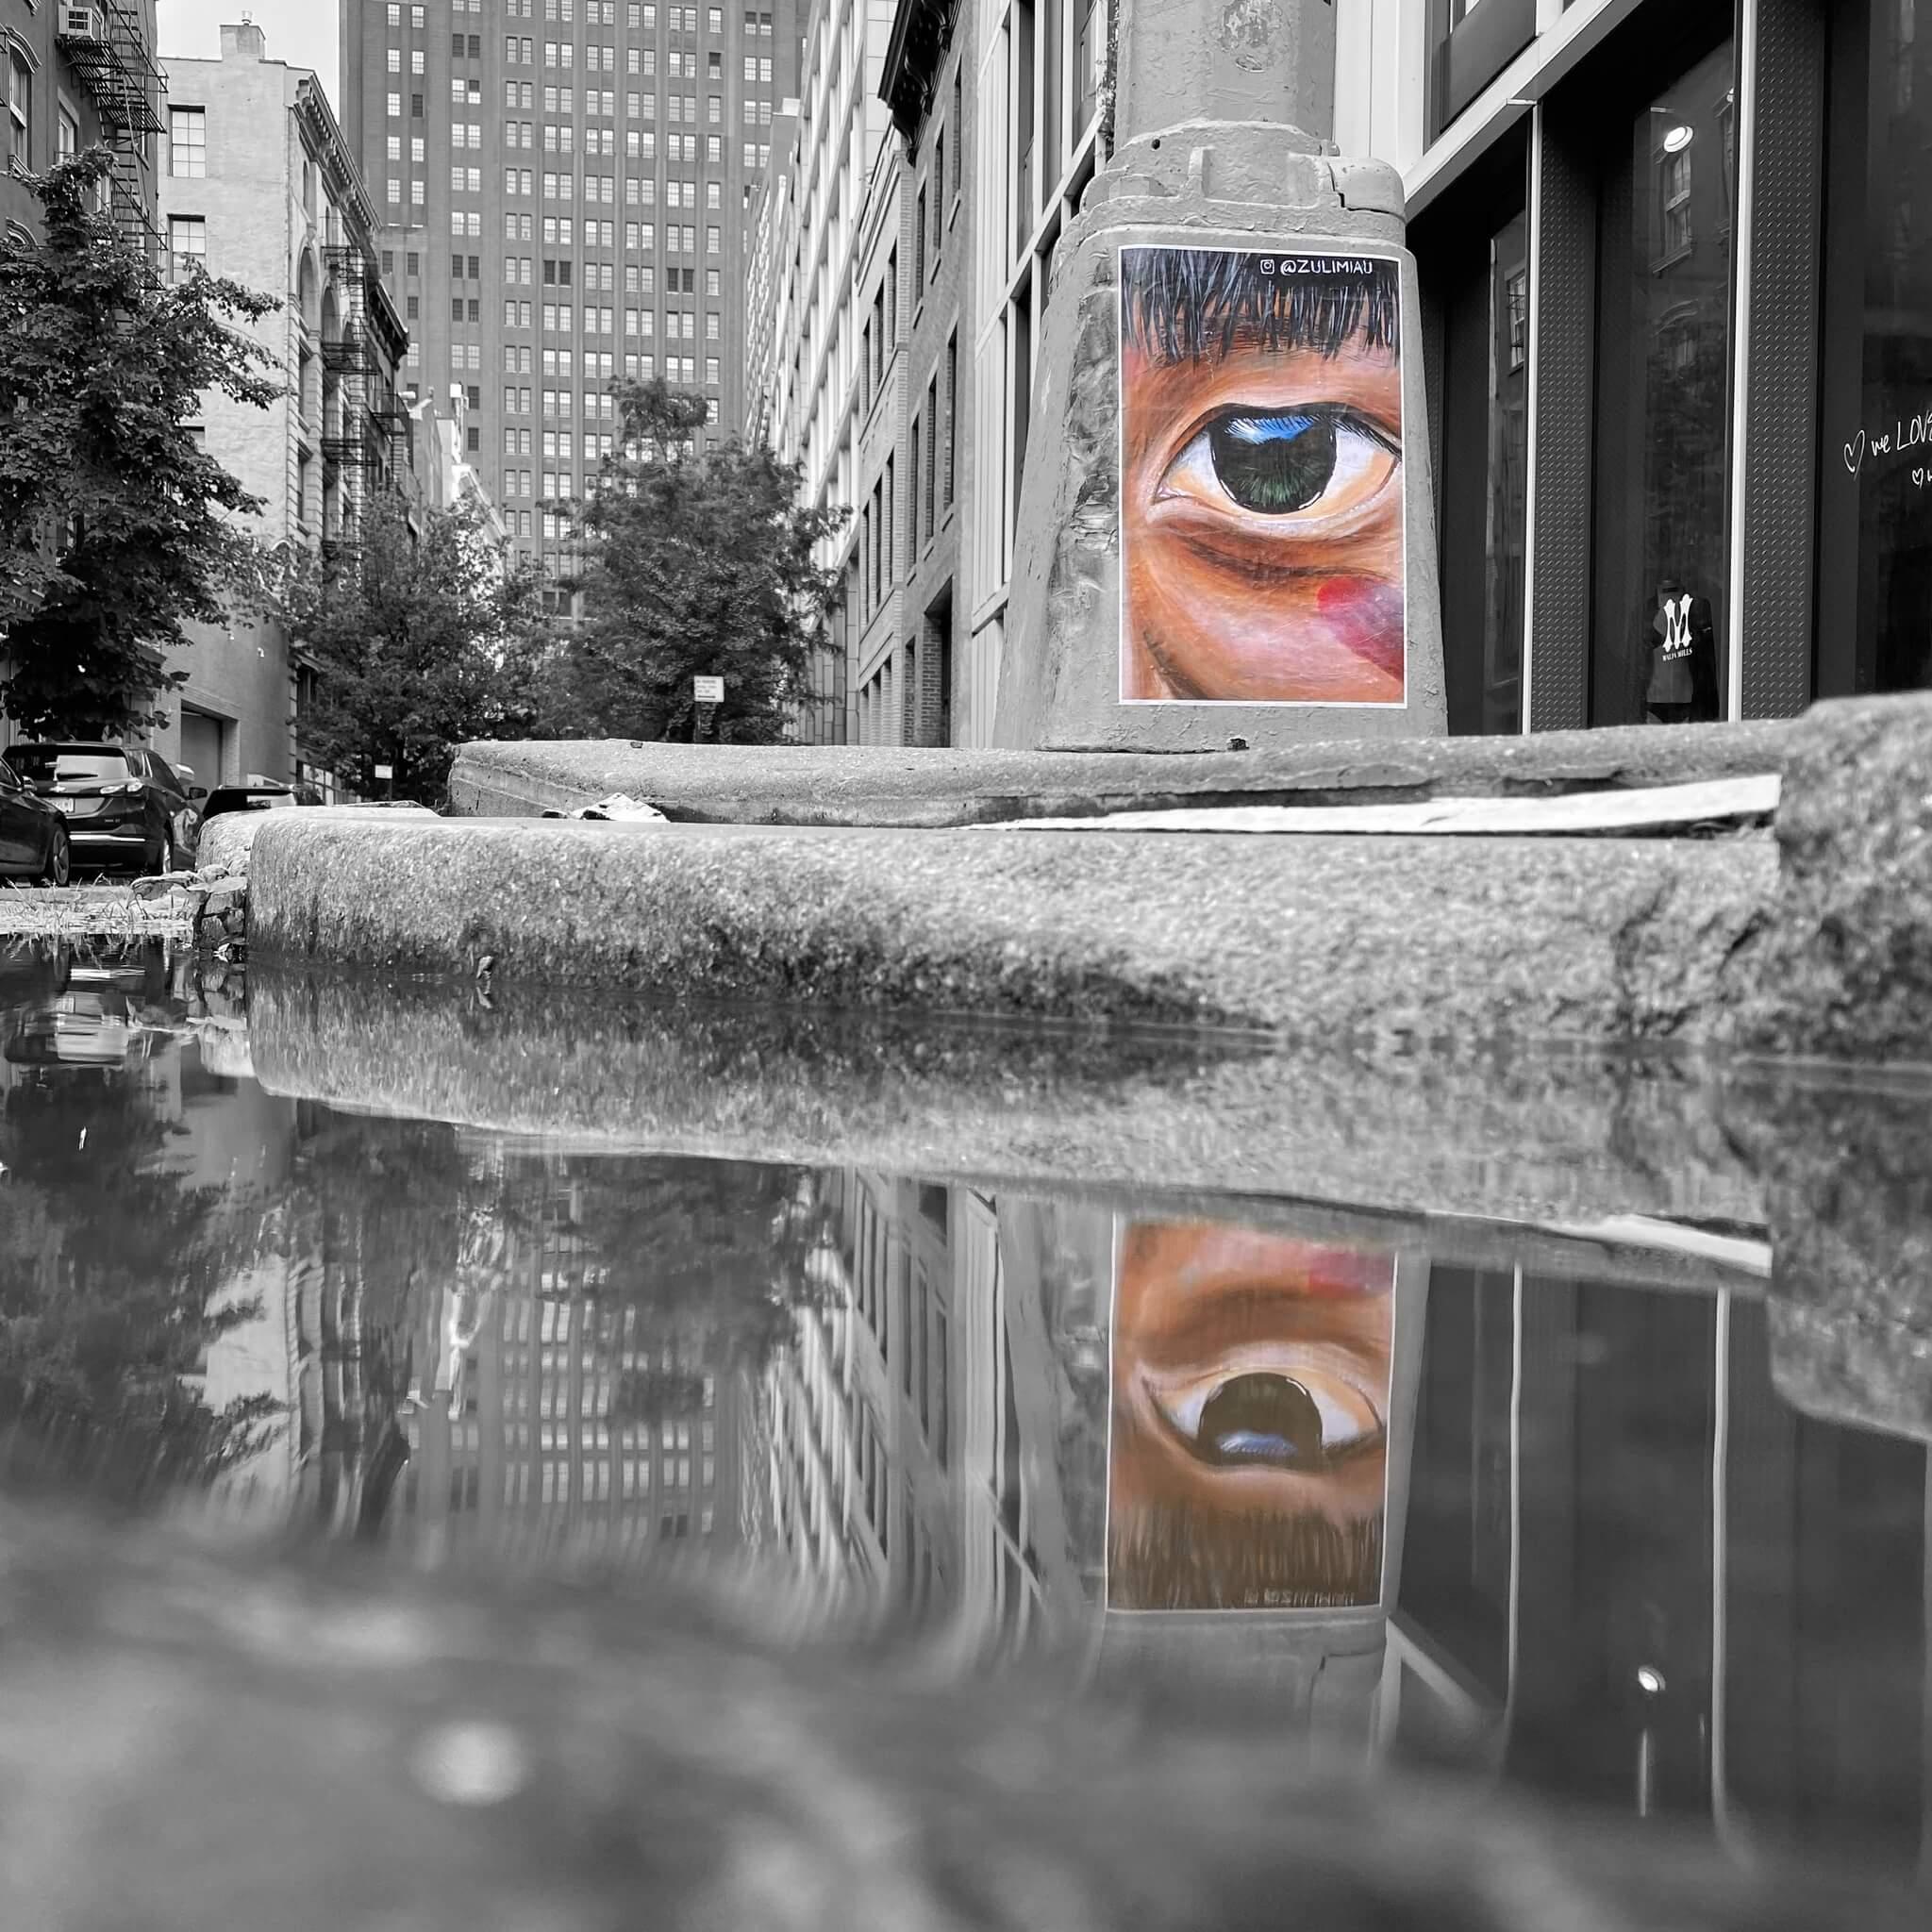 Black & White with Colour Splash - Street Art Photography by Sarah Sansom